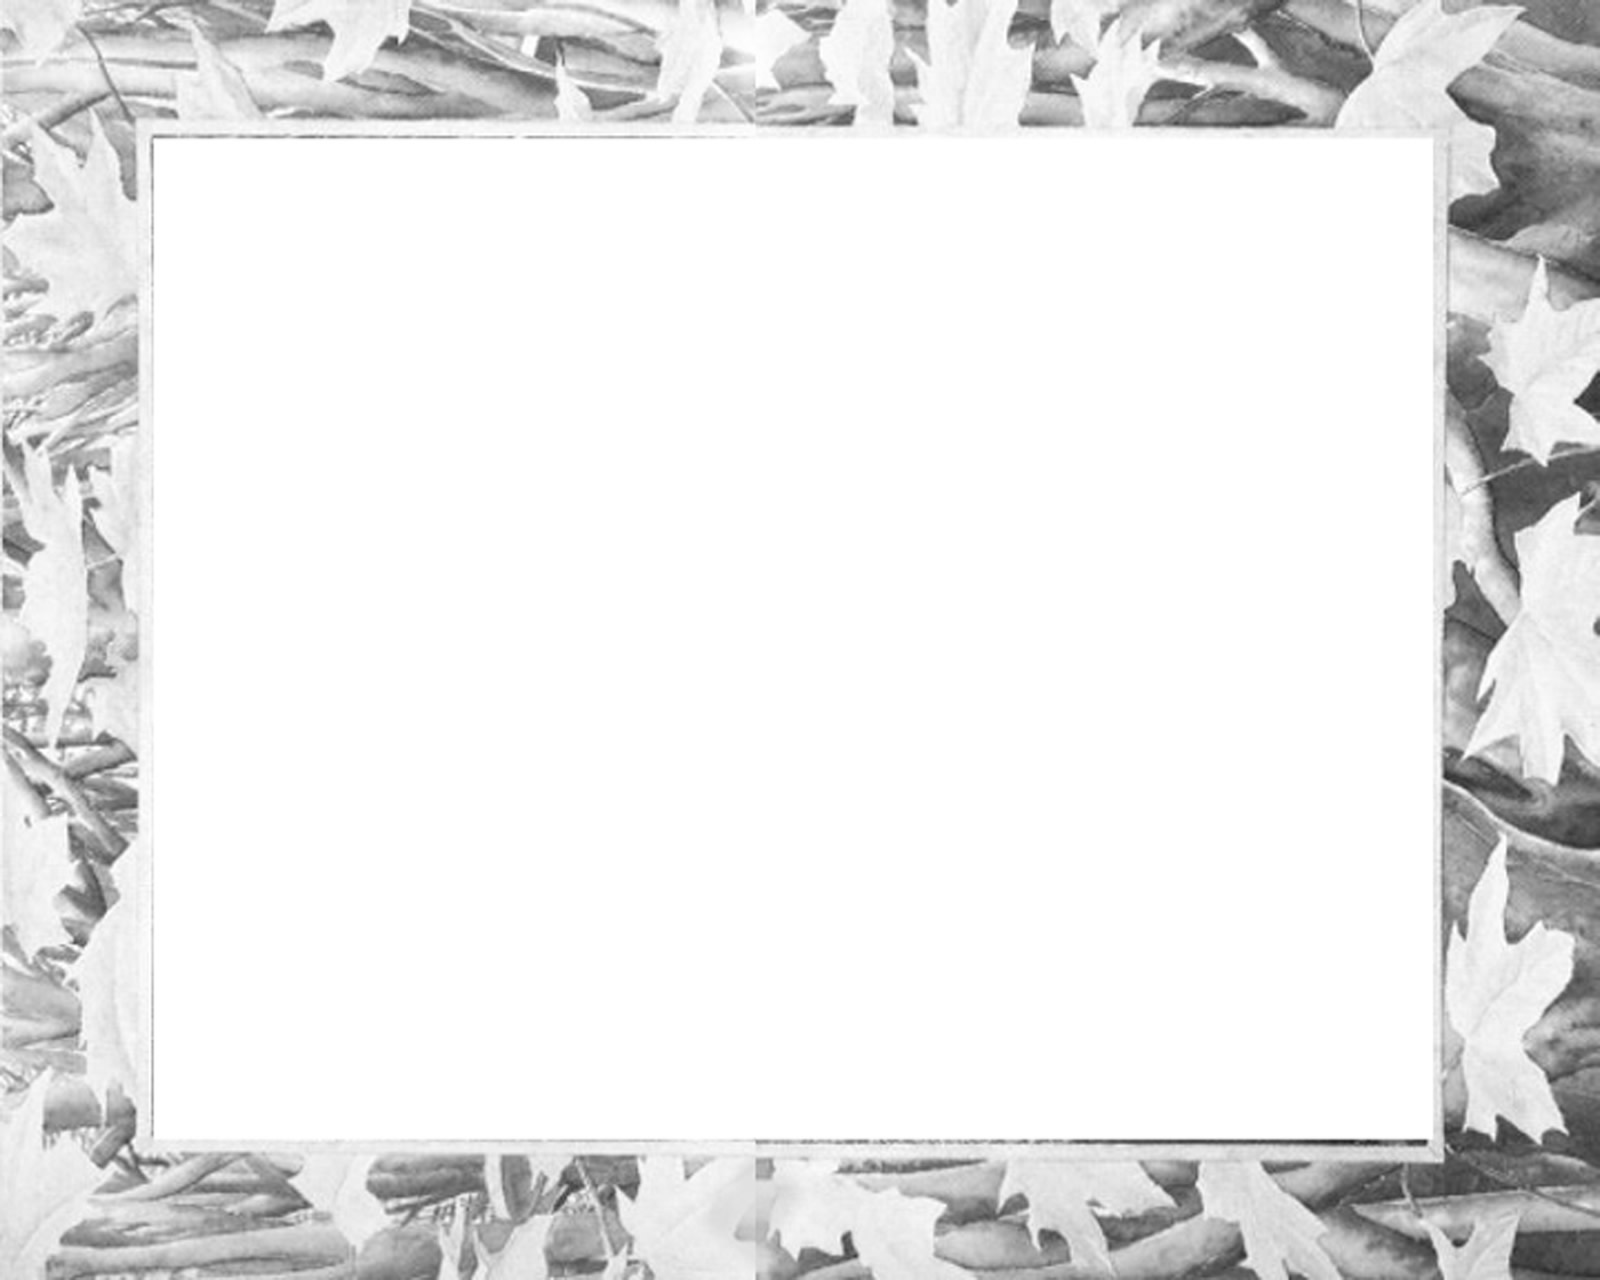 Animated Wallpaper Windows 7 Wallpaper Borders 1600x1280